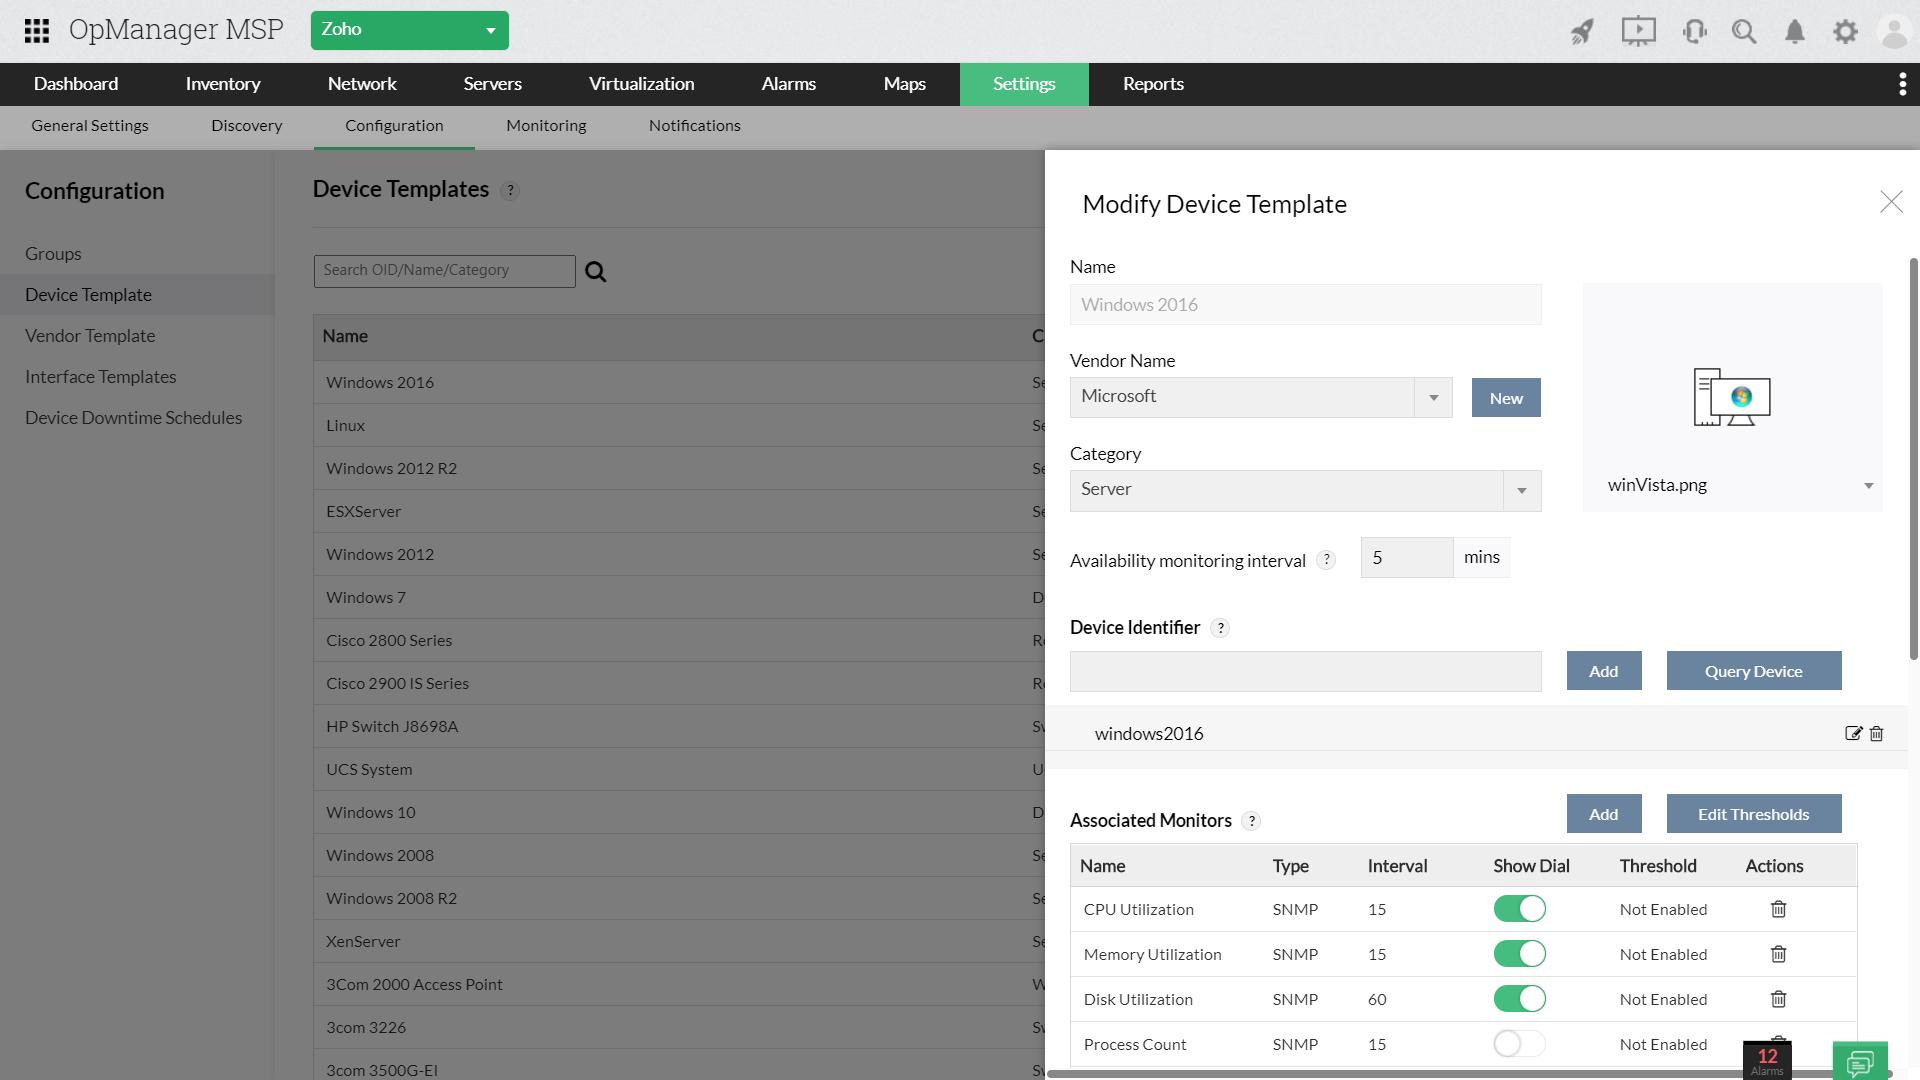 Server Performance Management MSP - ManageEngine OpManager MSP